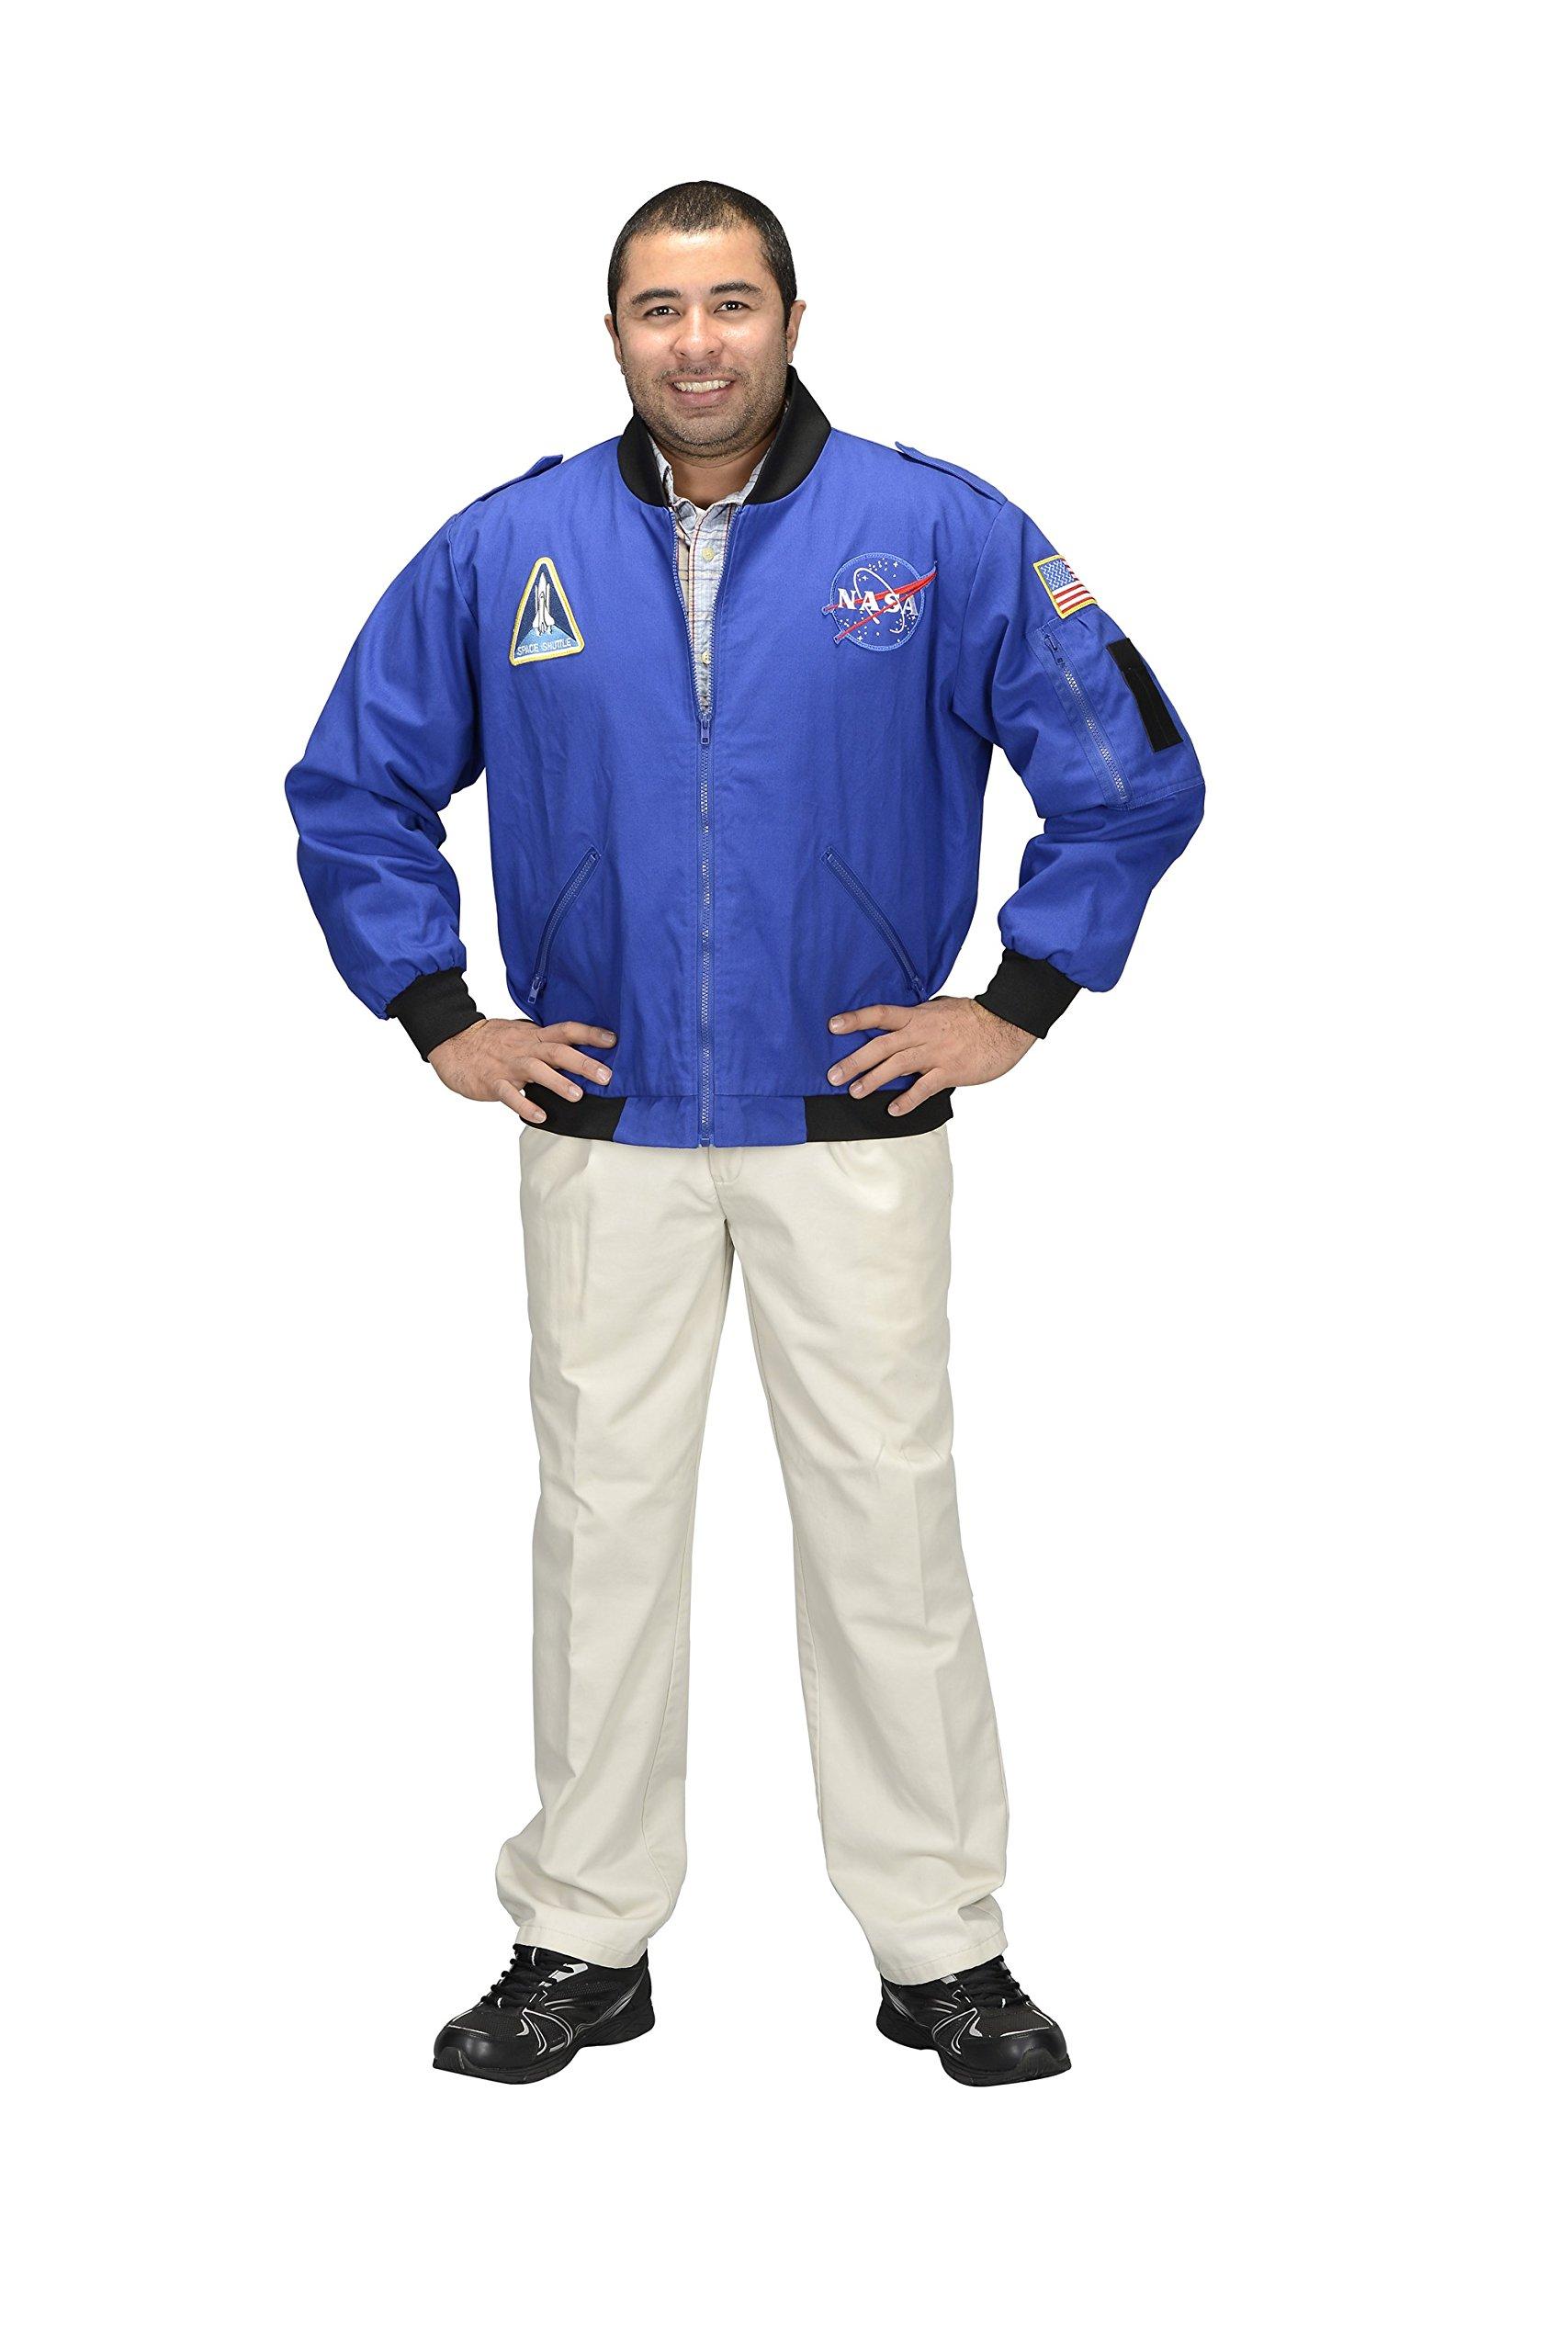 Aeromax Adult NASA Astronaut Flight Jacket, Medium, Blue